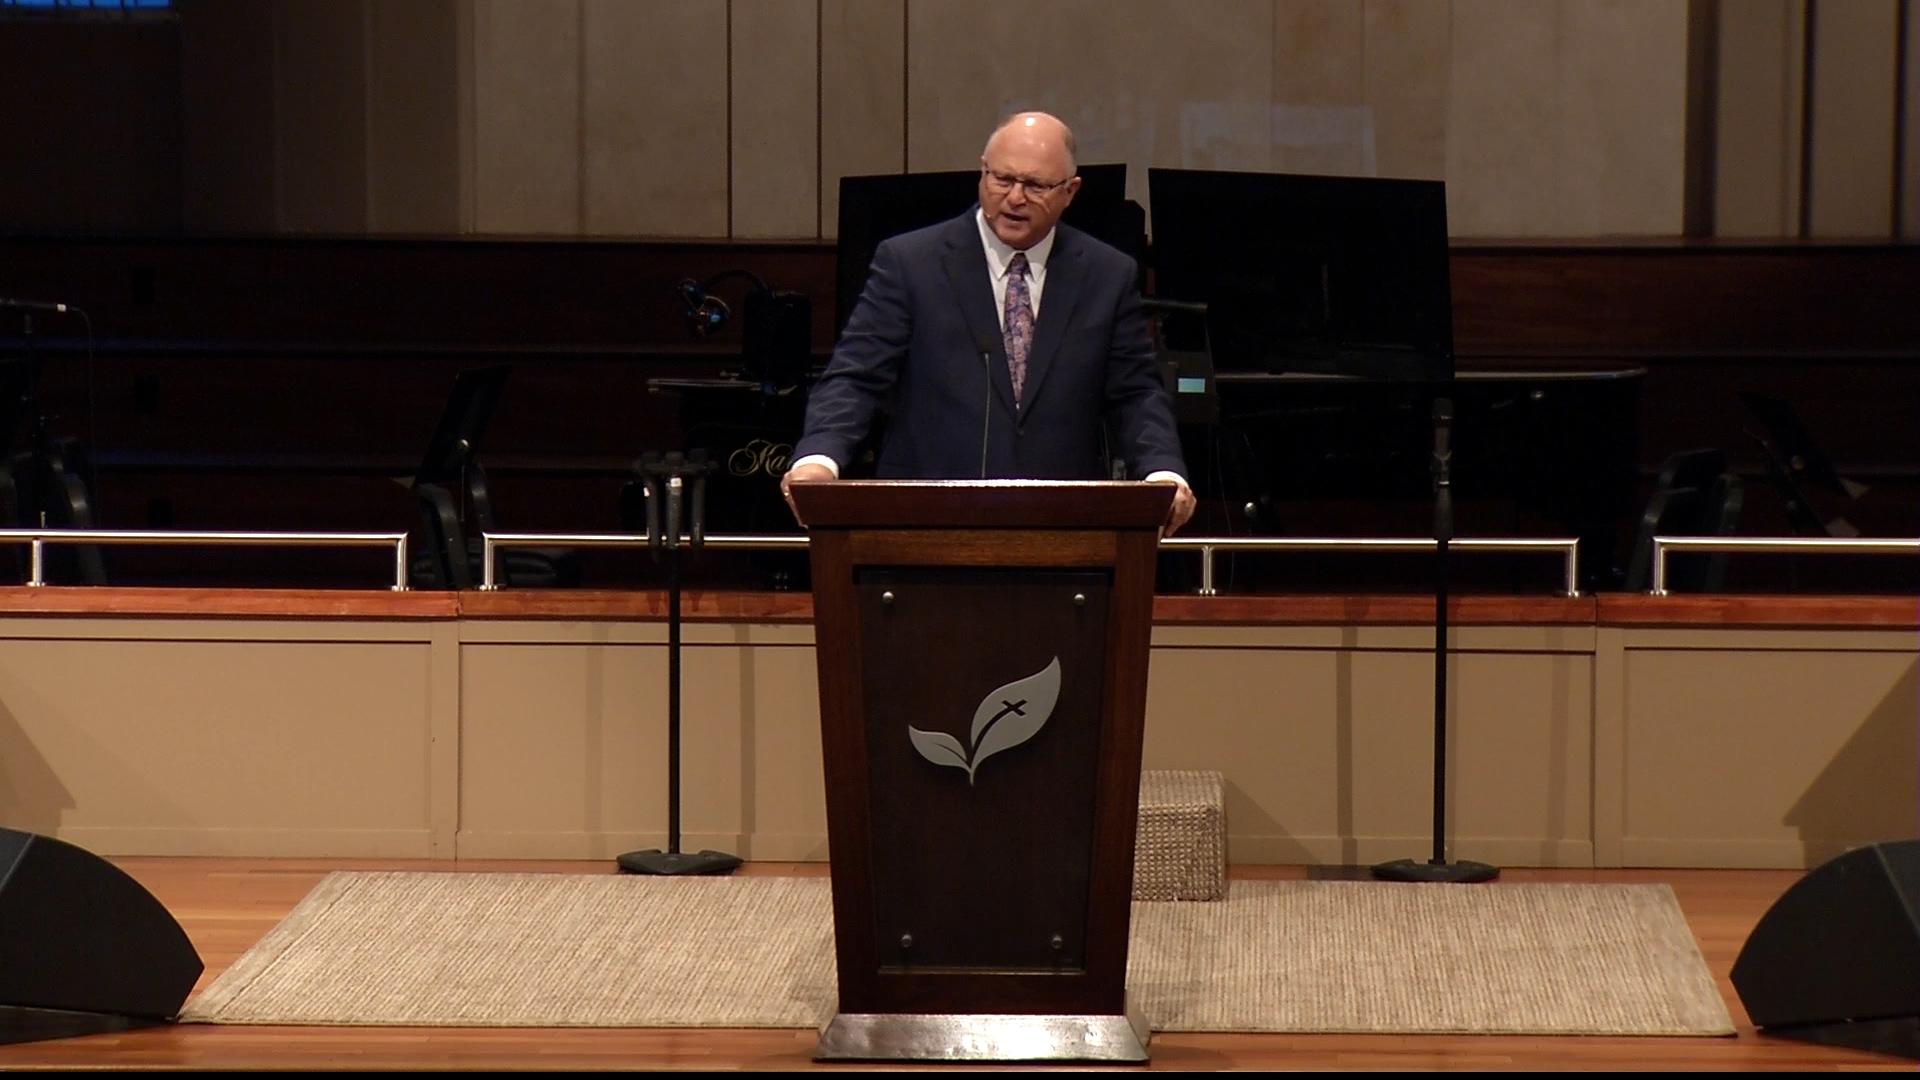 Pastor Paul Chappell: Building for the Children